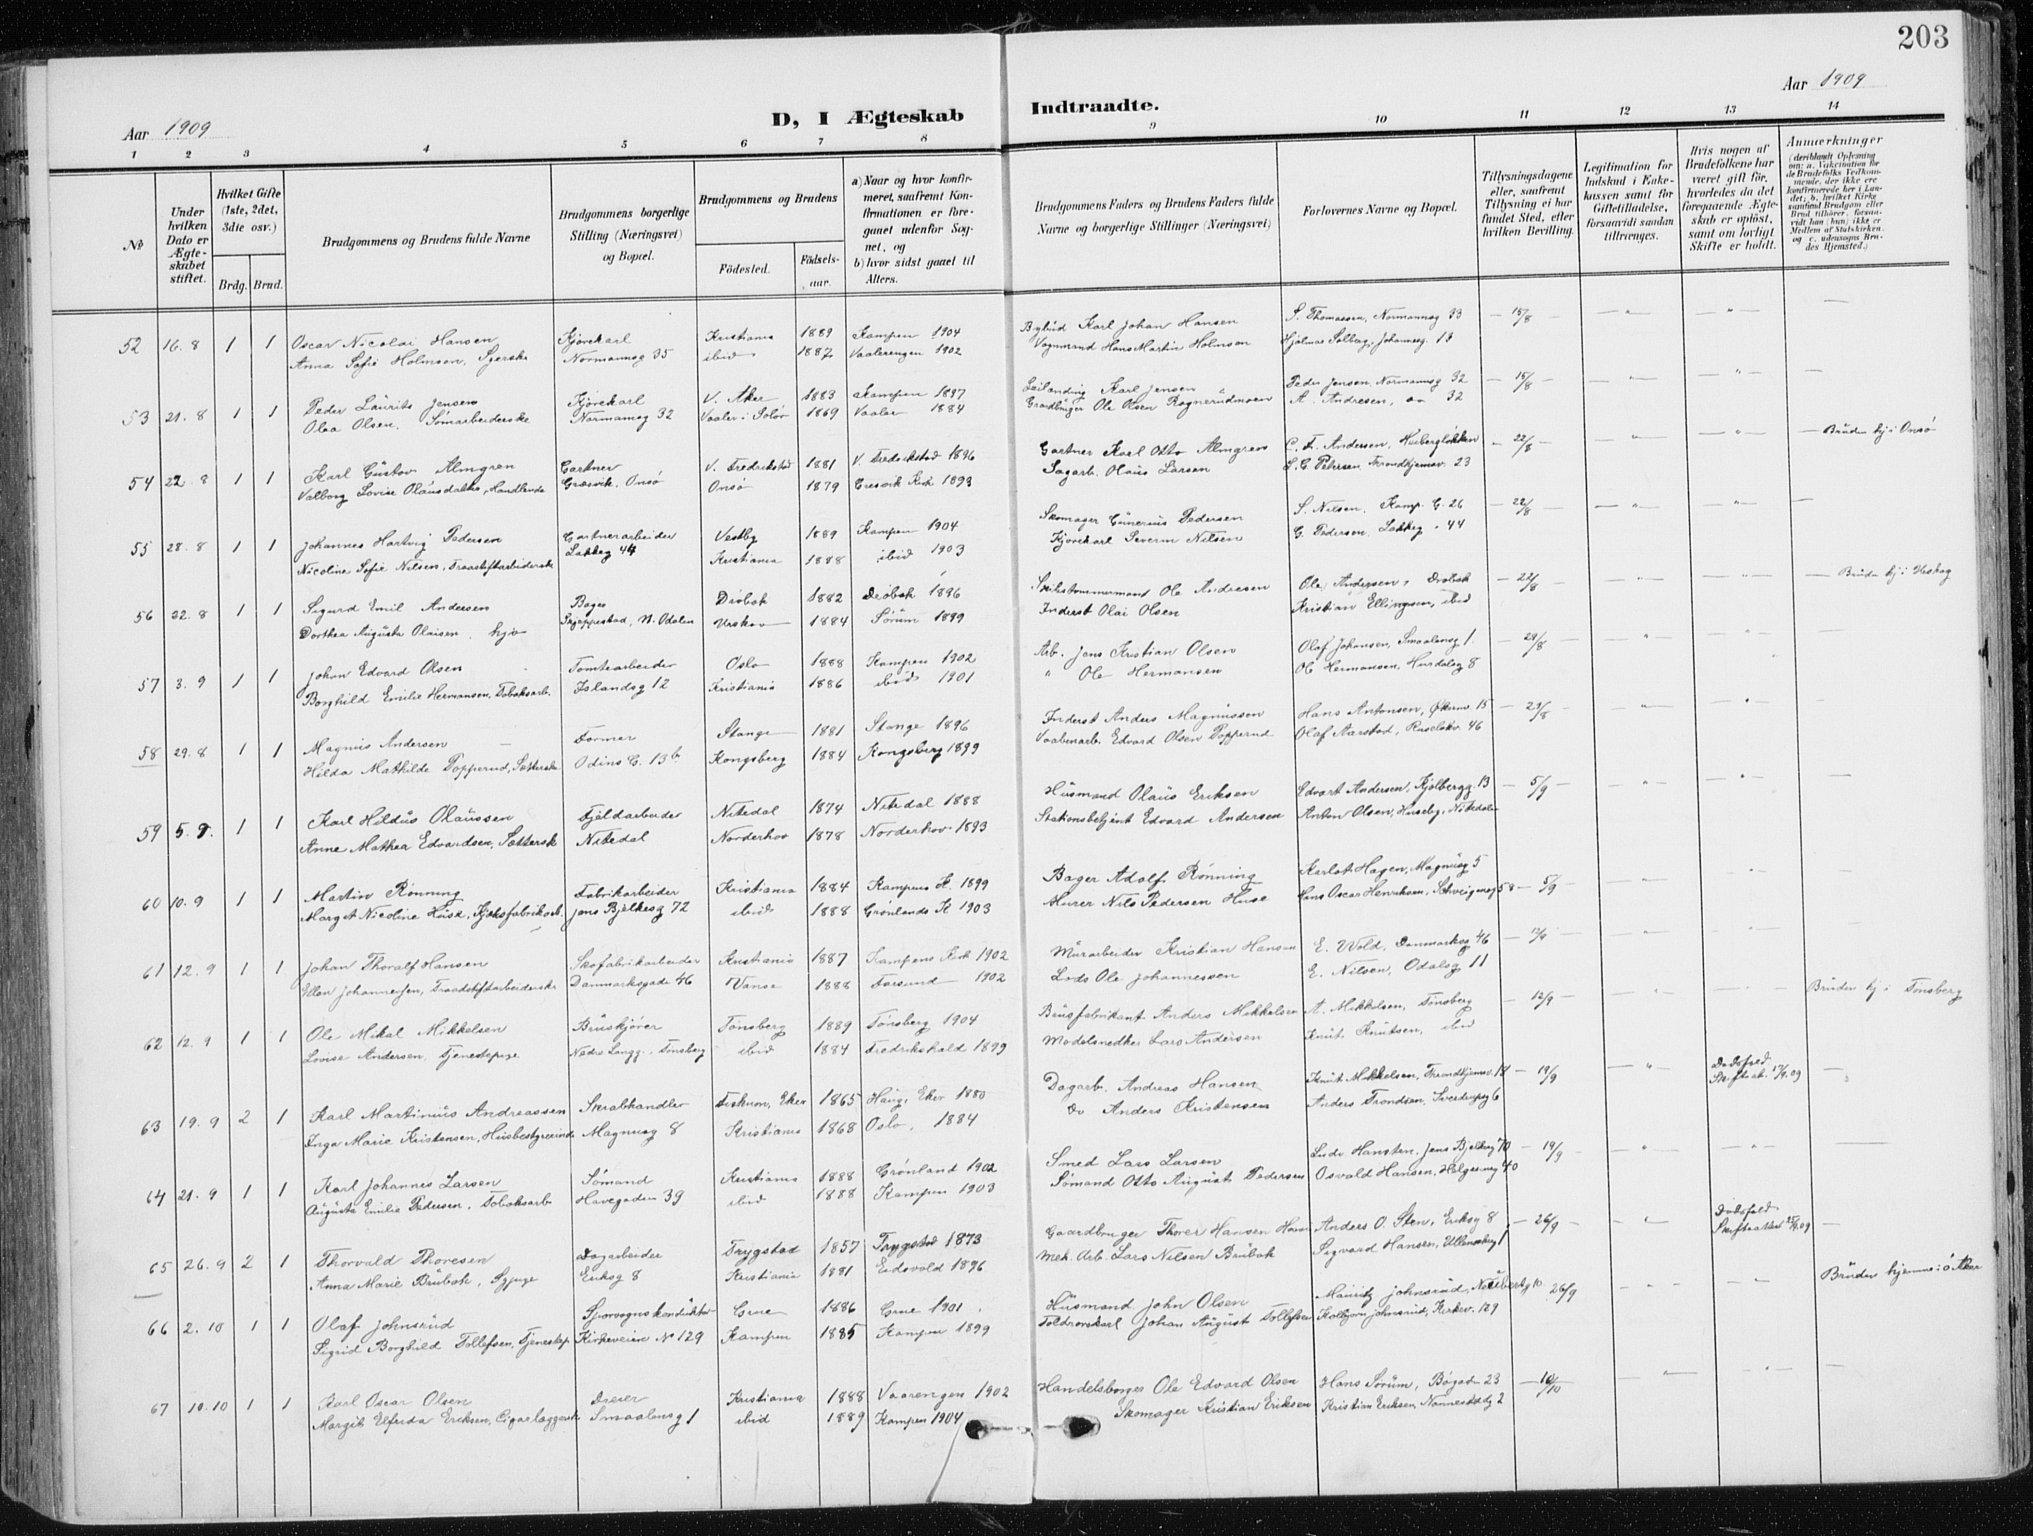 SAO, Kampen prestekontor Kirkebøker, F/Fa/L0011: Ministerialbok nr. I 11, 1907-1917, s. 203